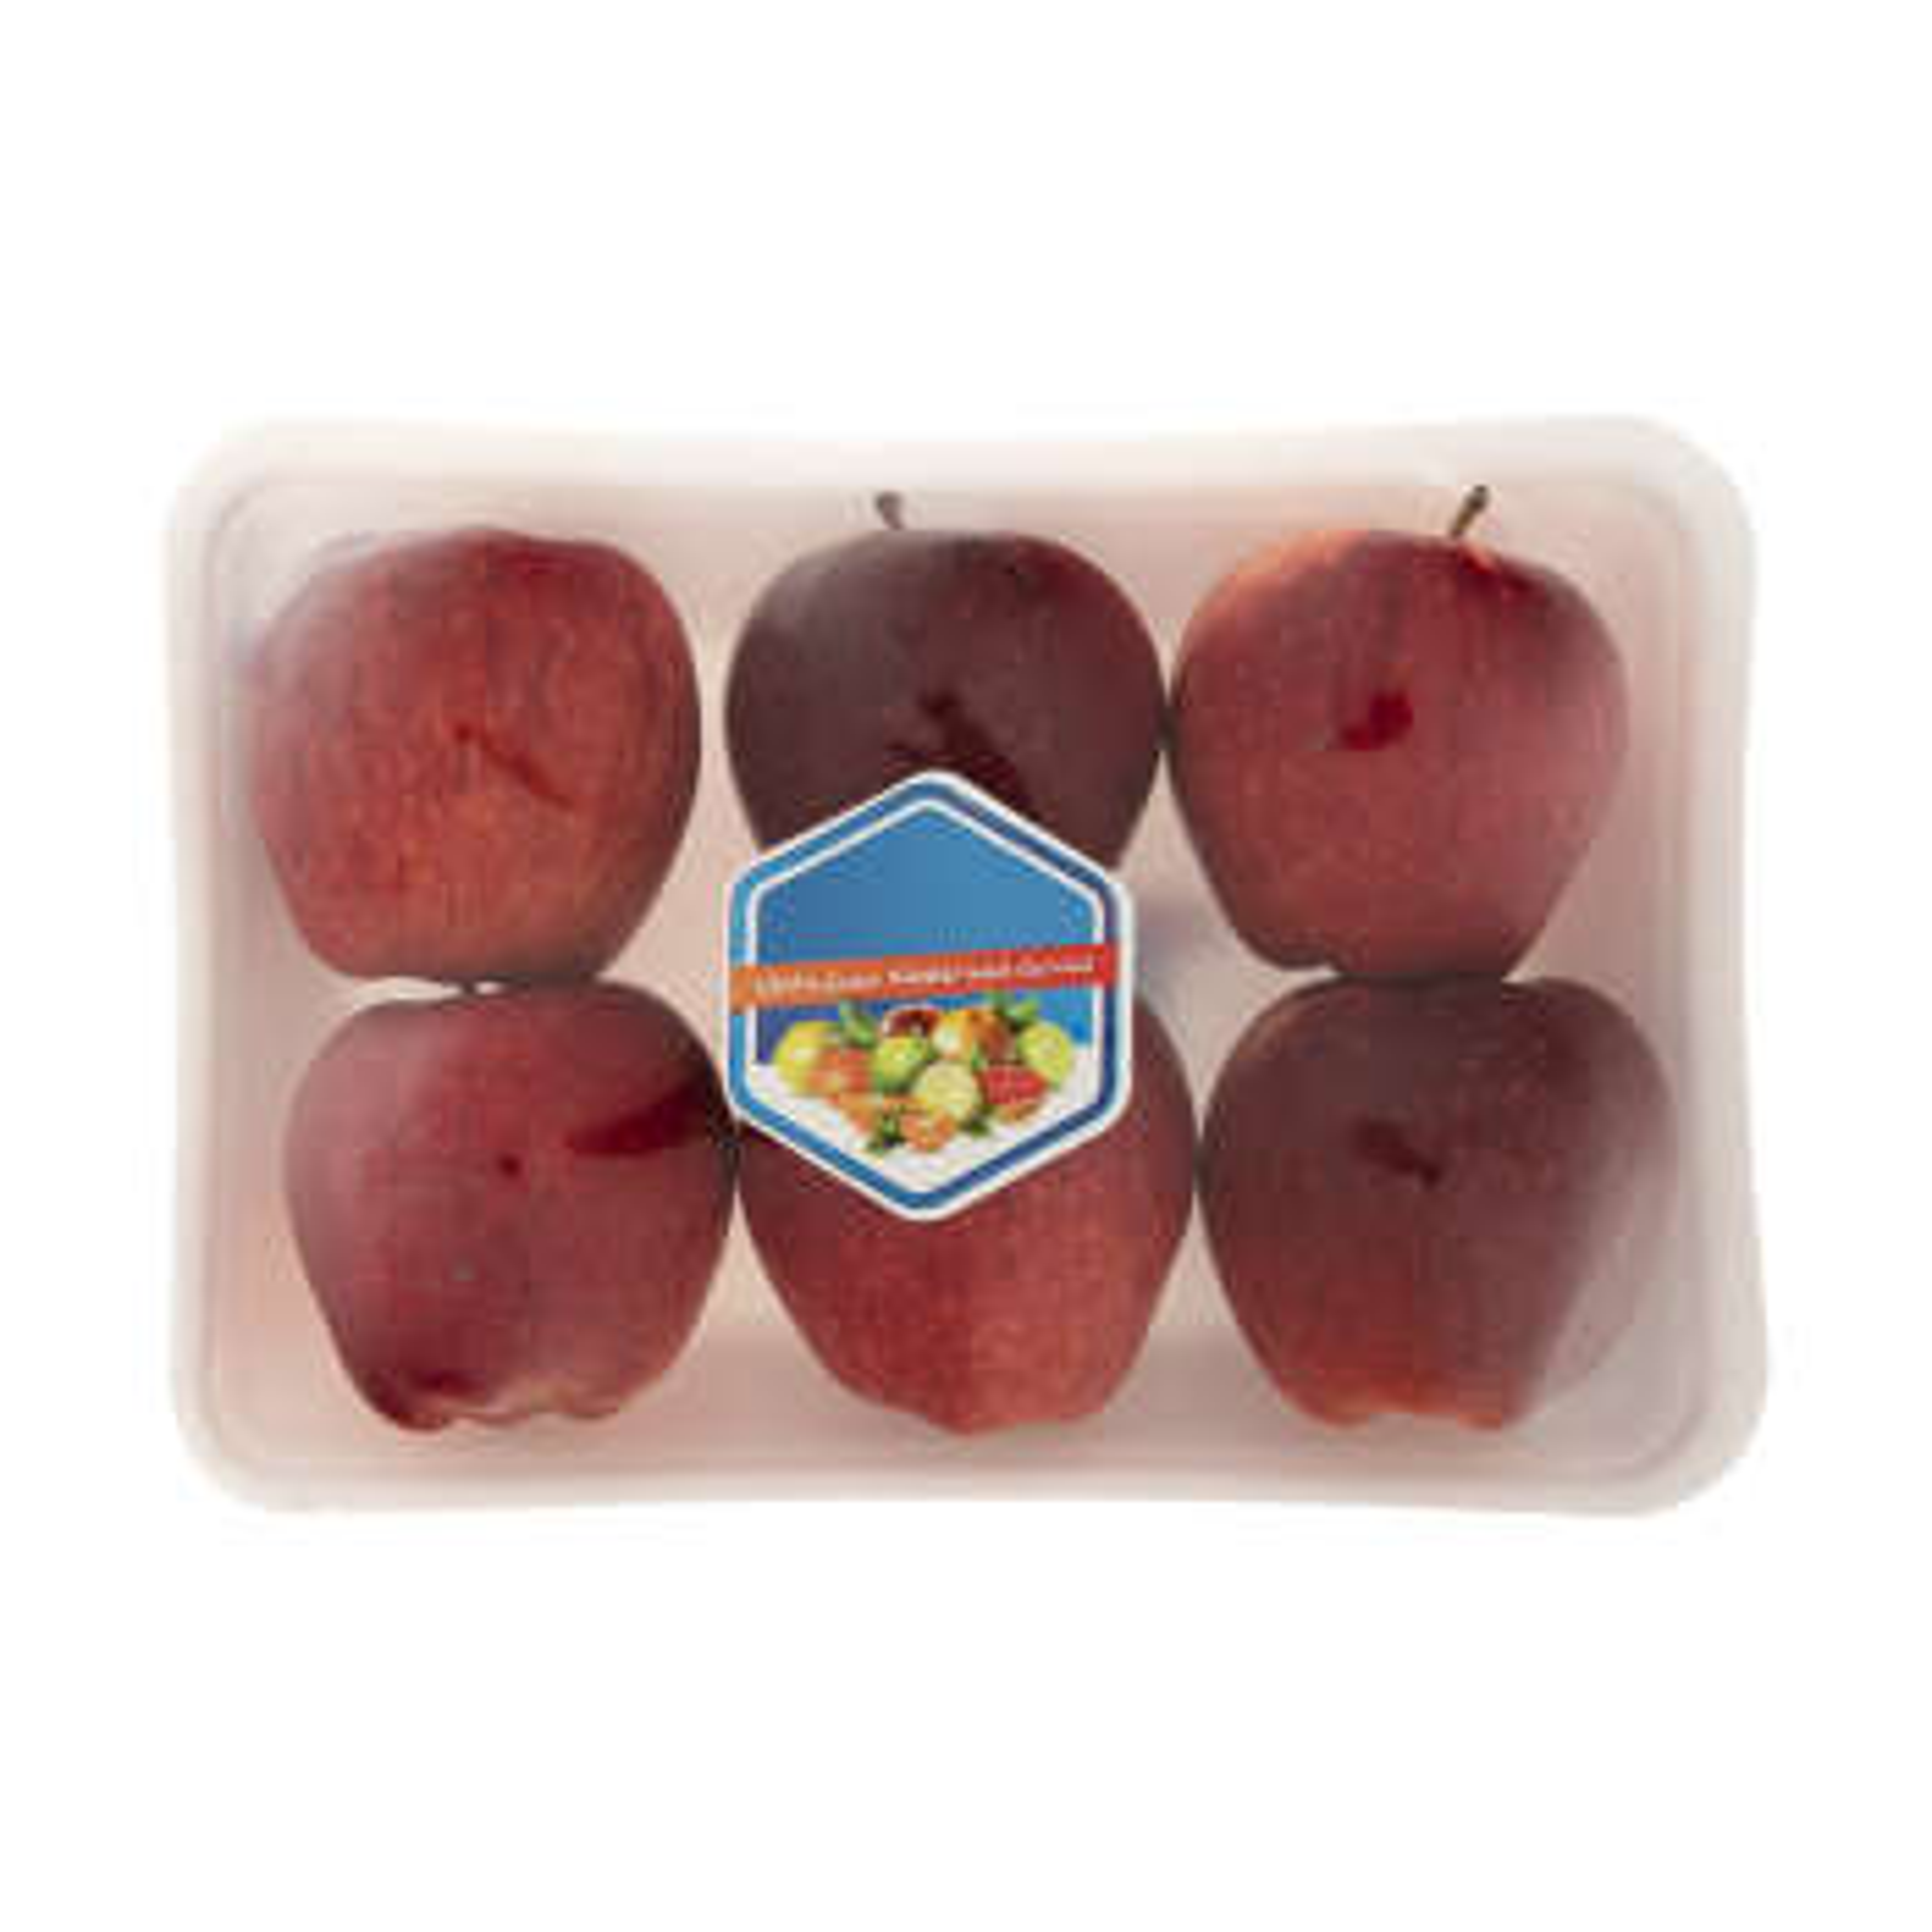 سیب قرمز میوه پلاس - 1 کیلوگرم